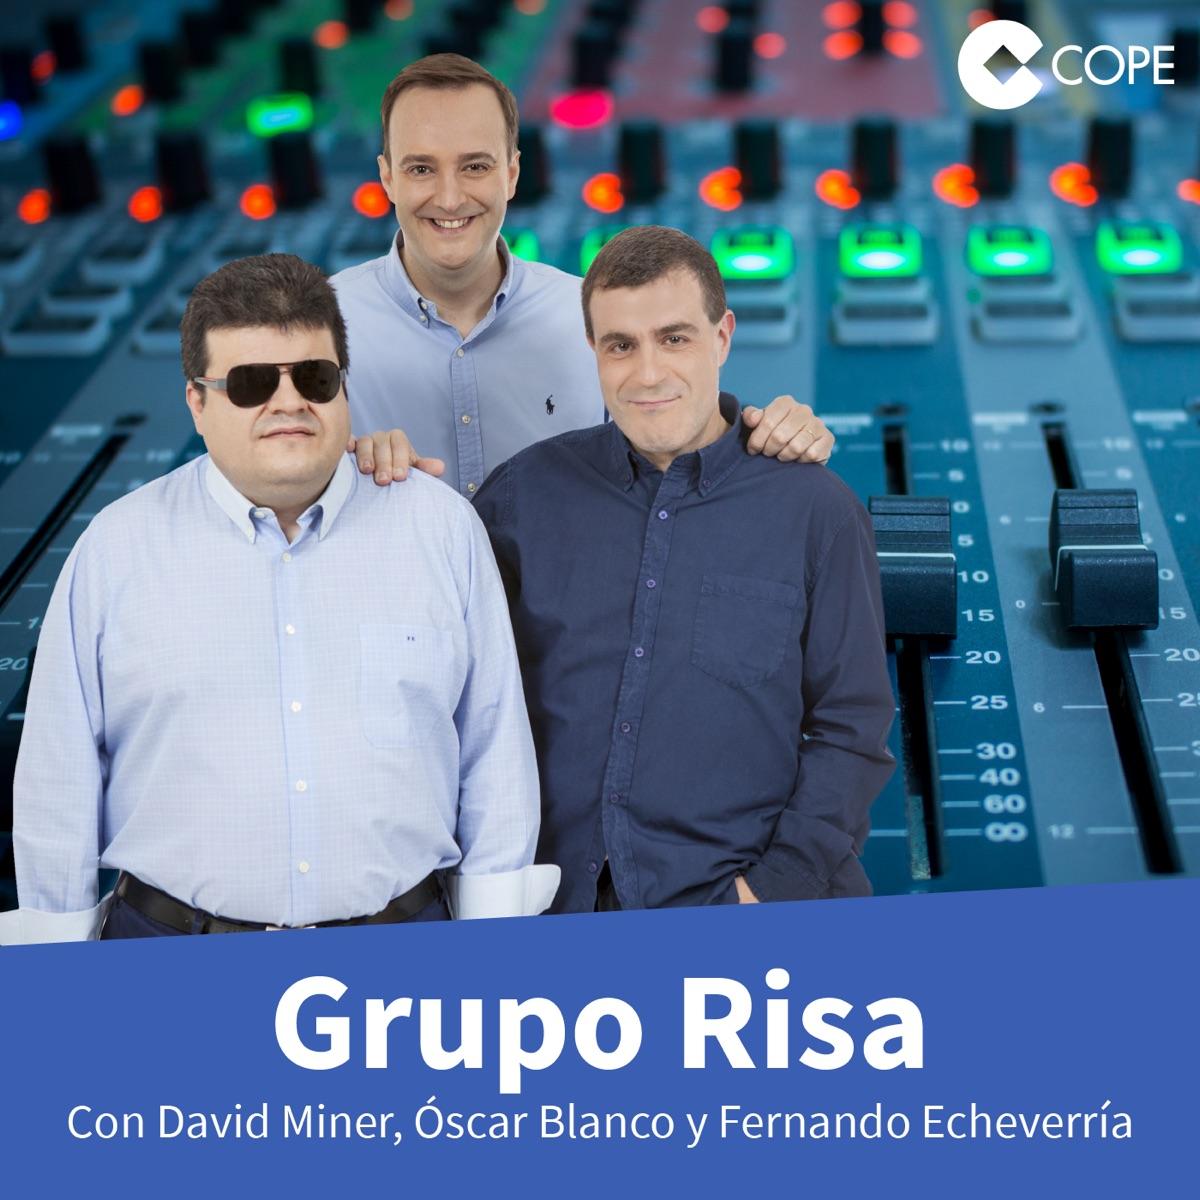 Grupo Risa